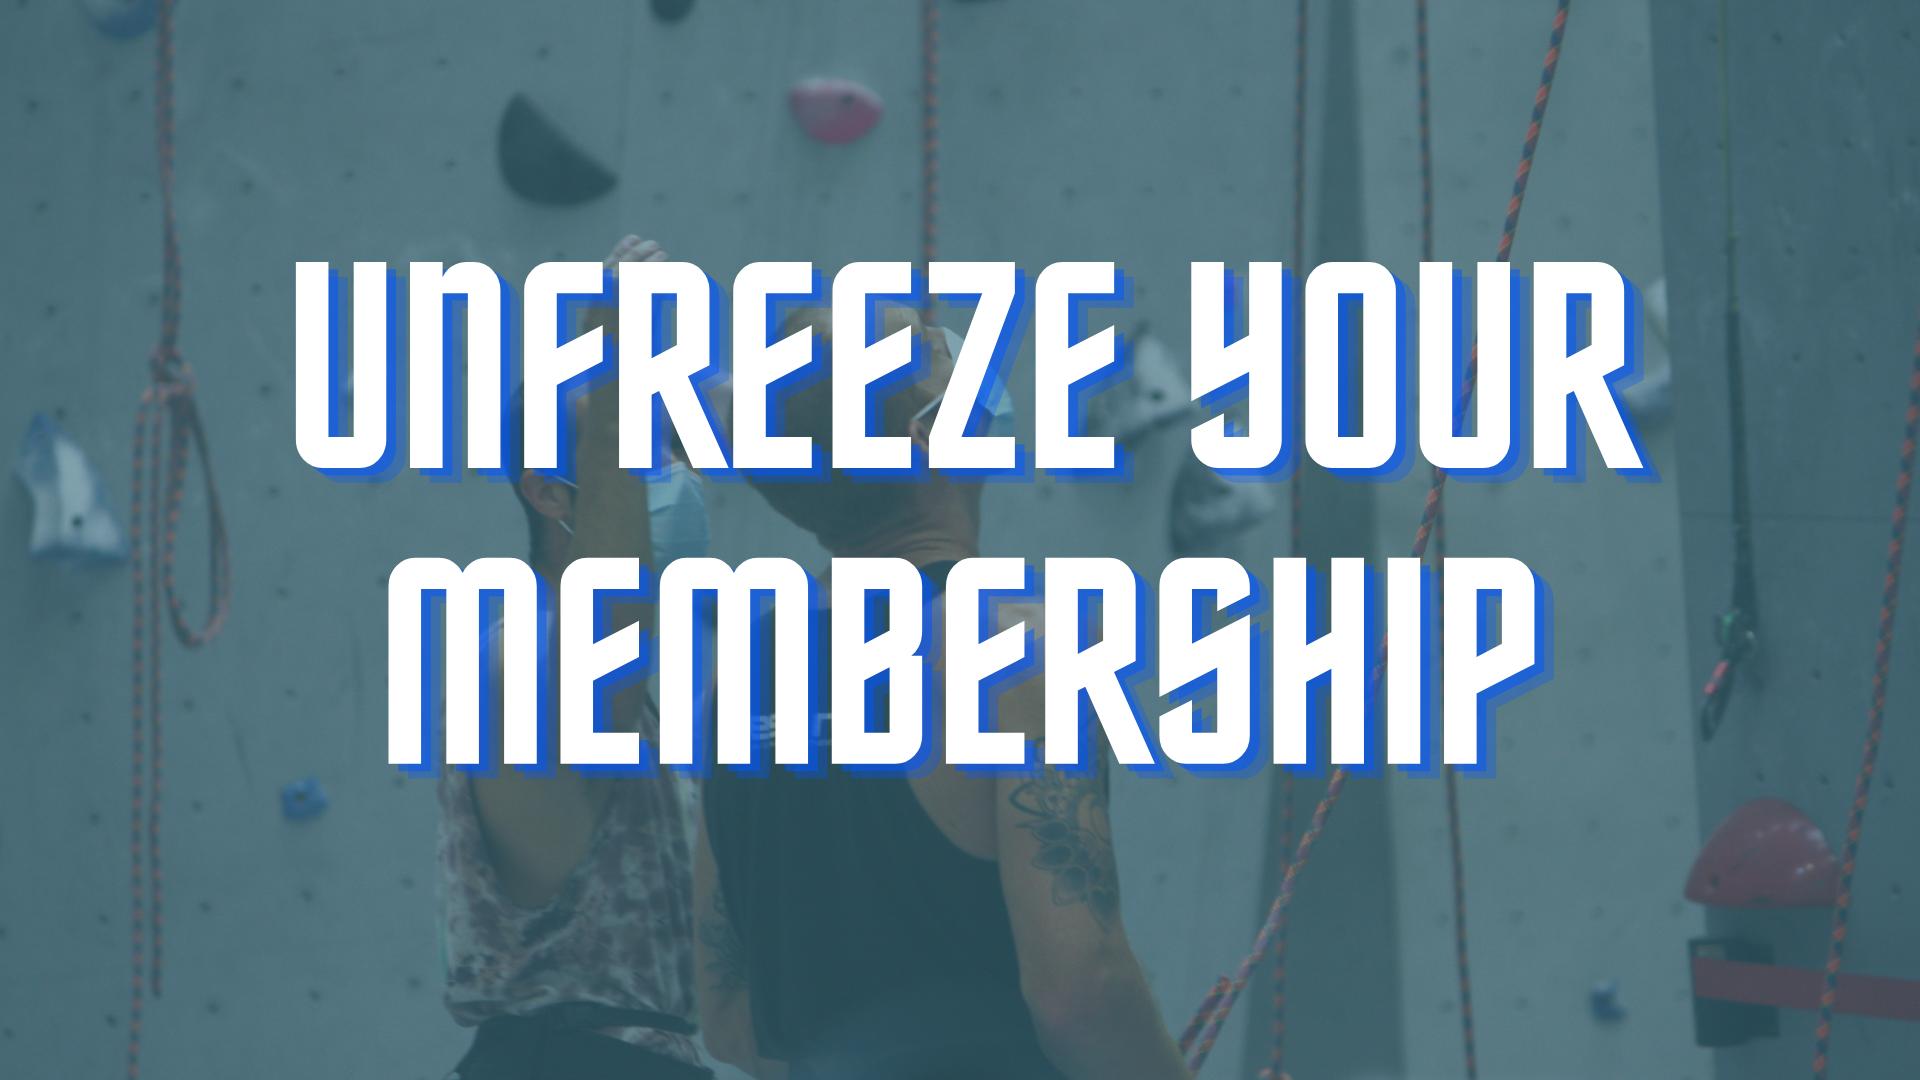 Unfreeze your Membership